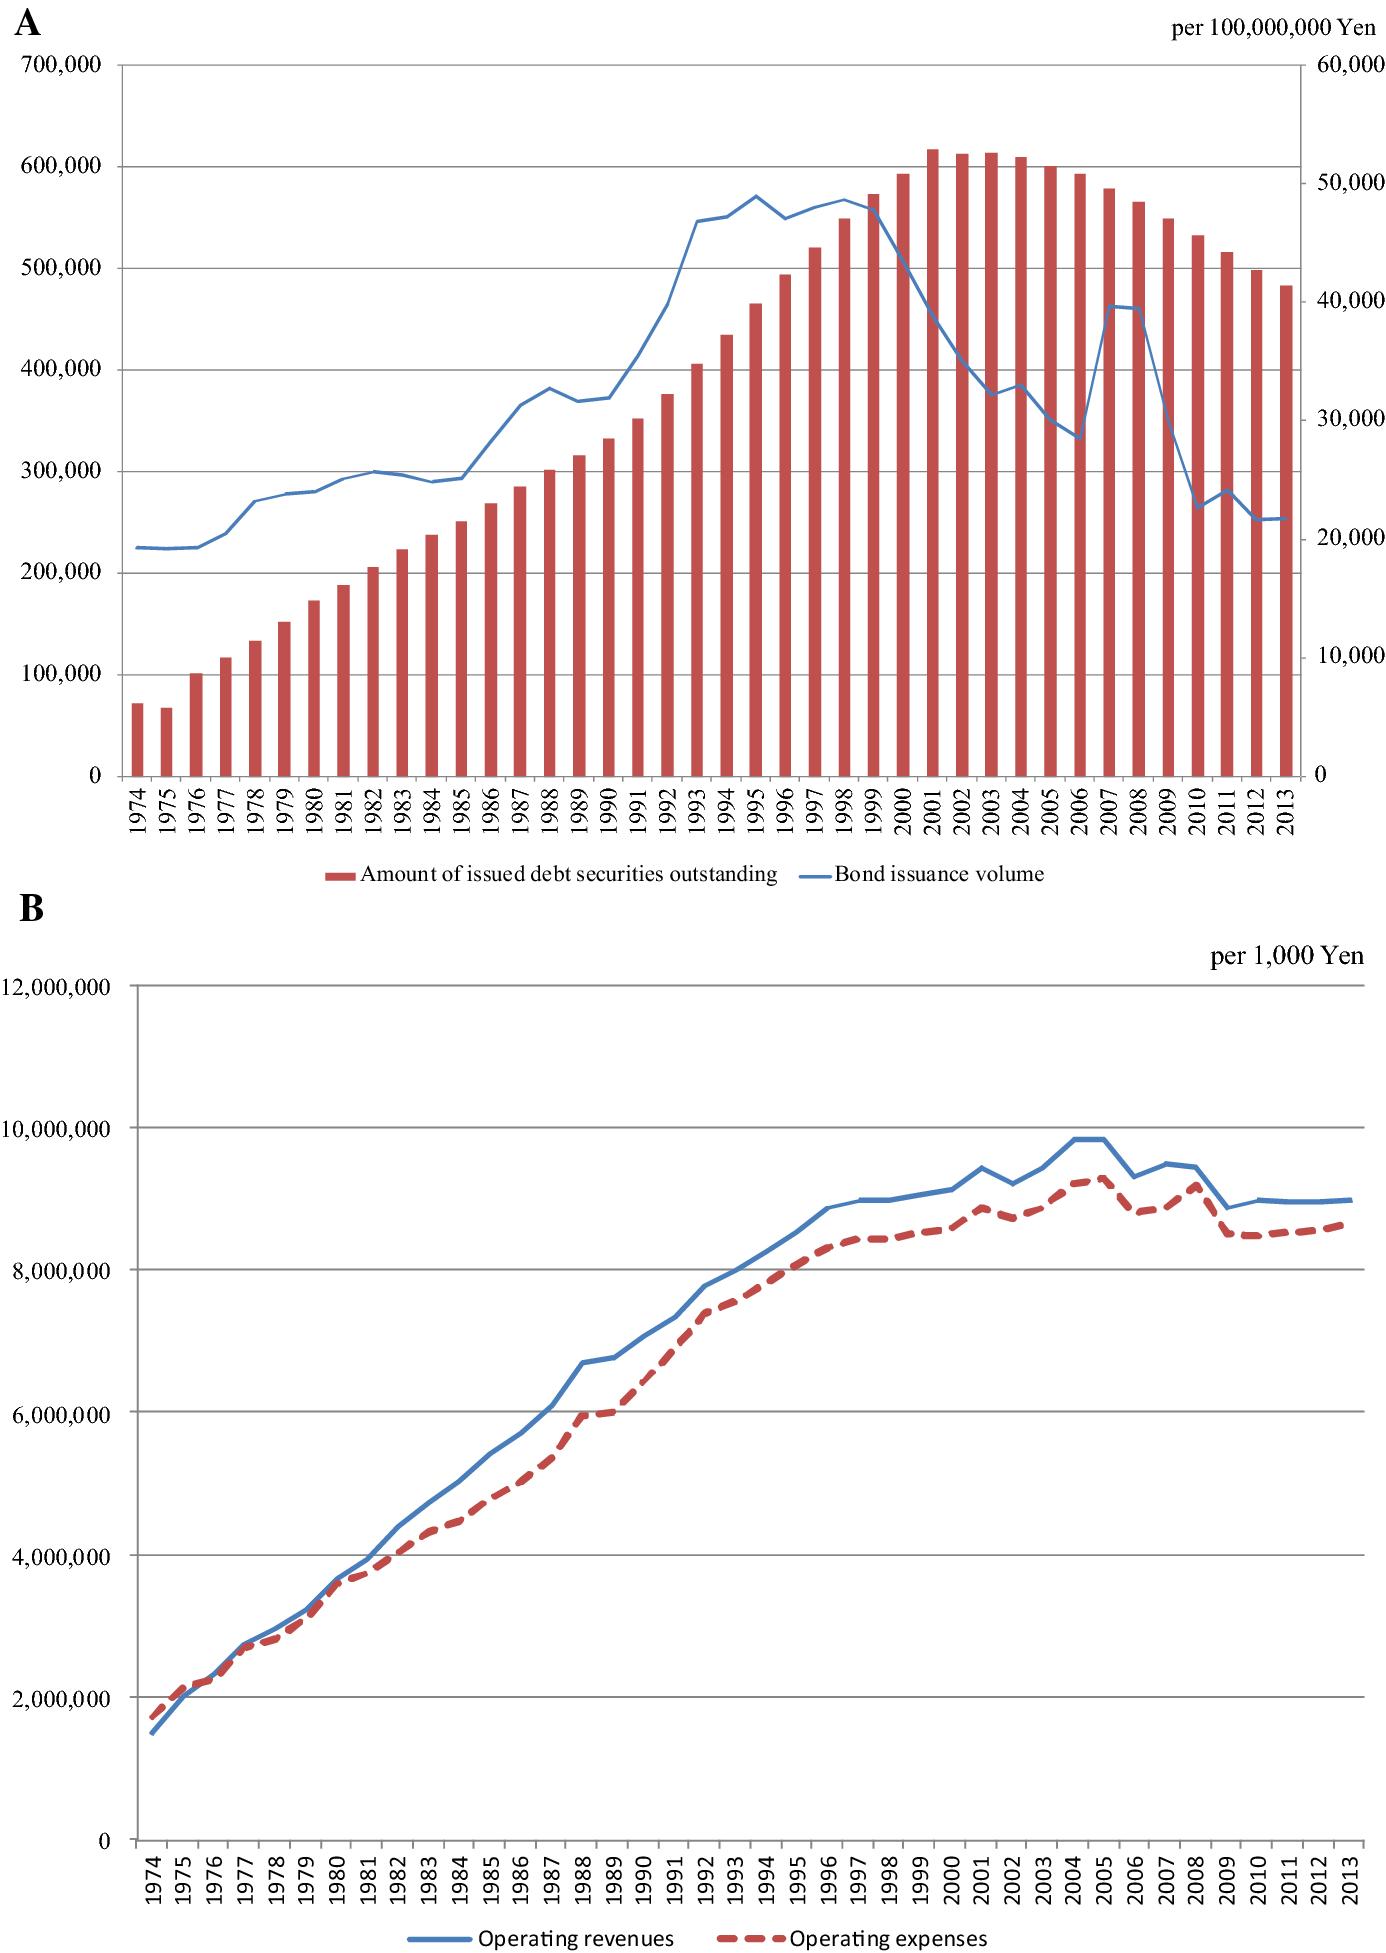 Asymmetric cost behavior in local public enterprises